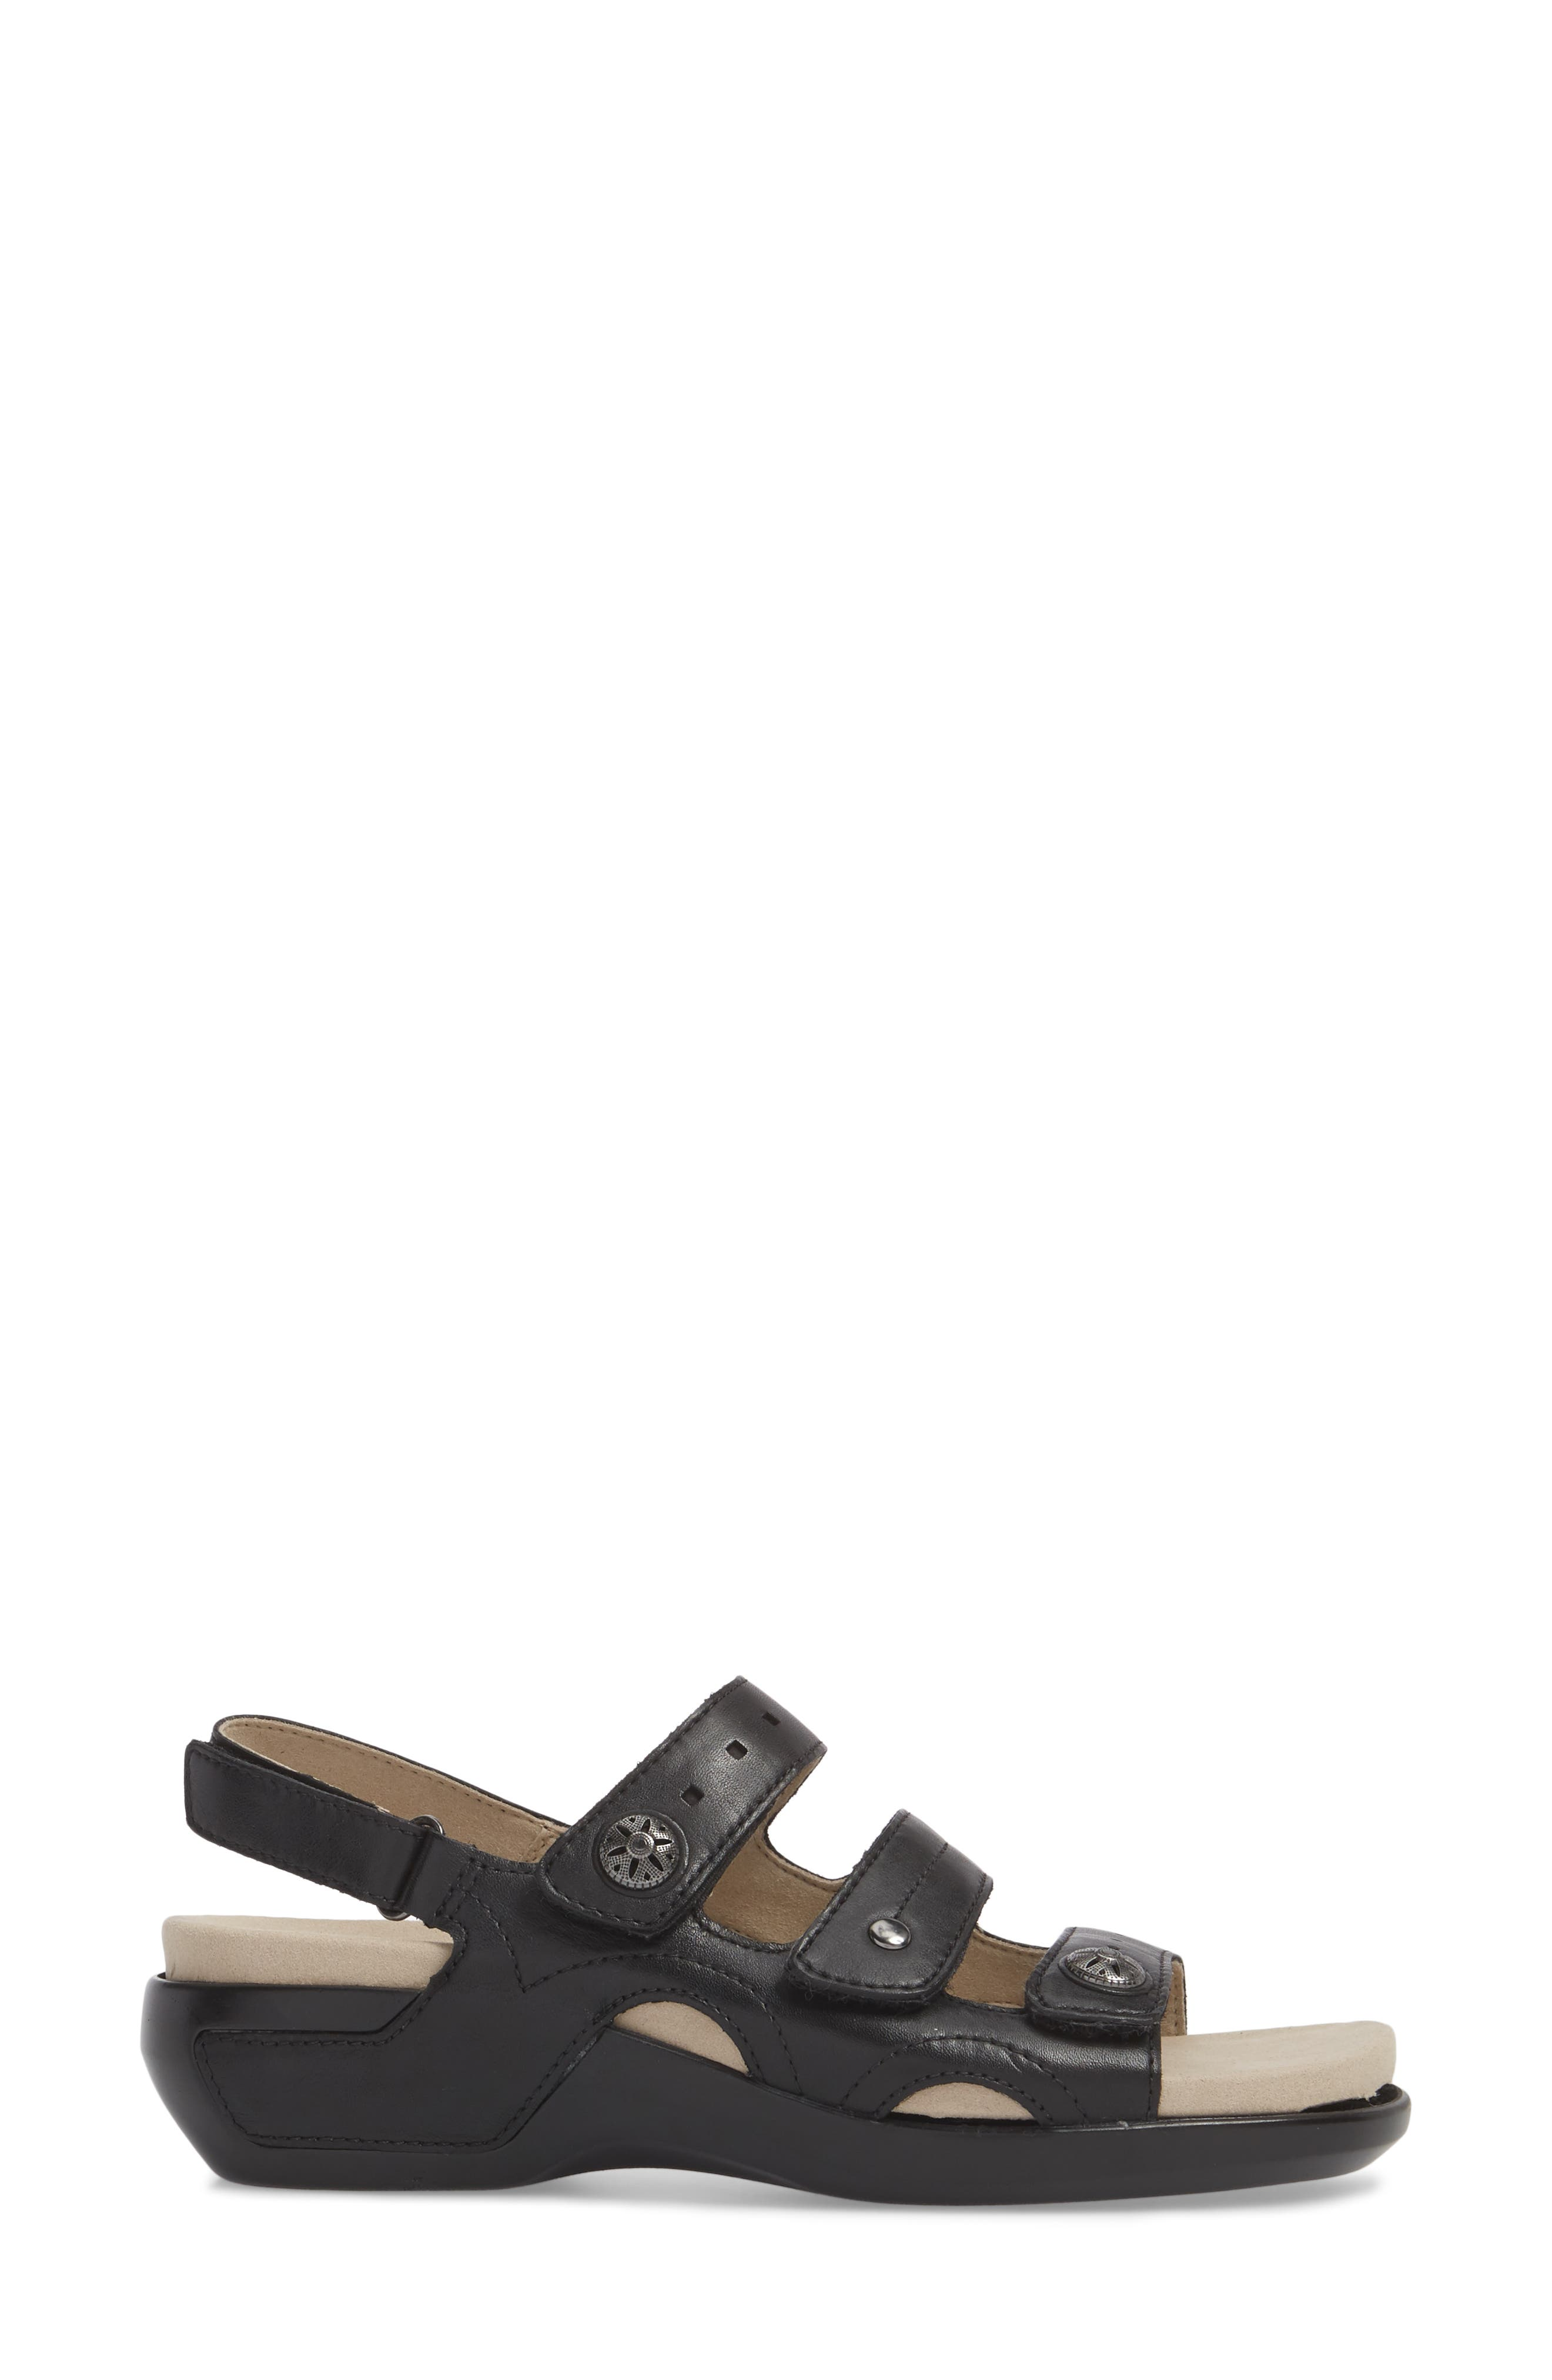 Three Strap Sandal,                             Alternate thumbnail 3, color,                             BLACK LEATHER